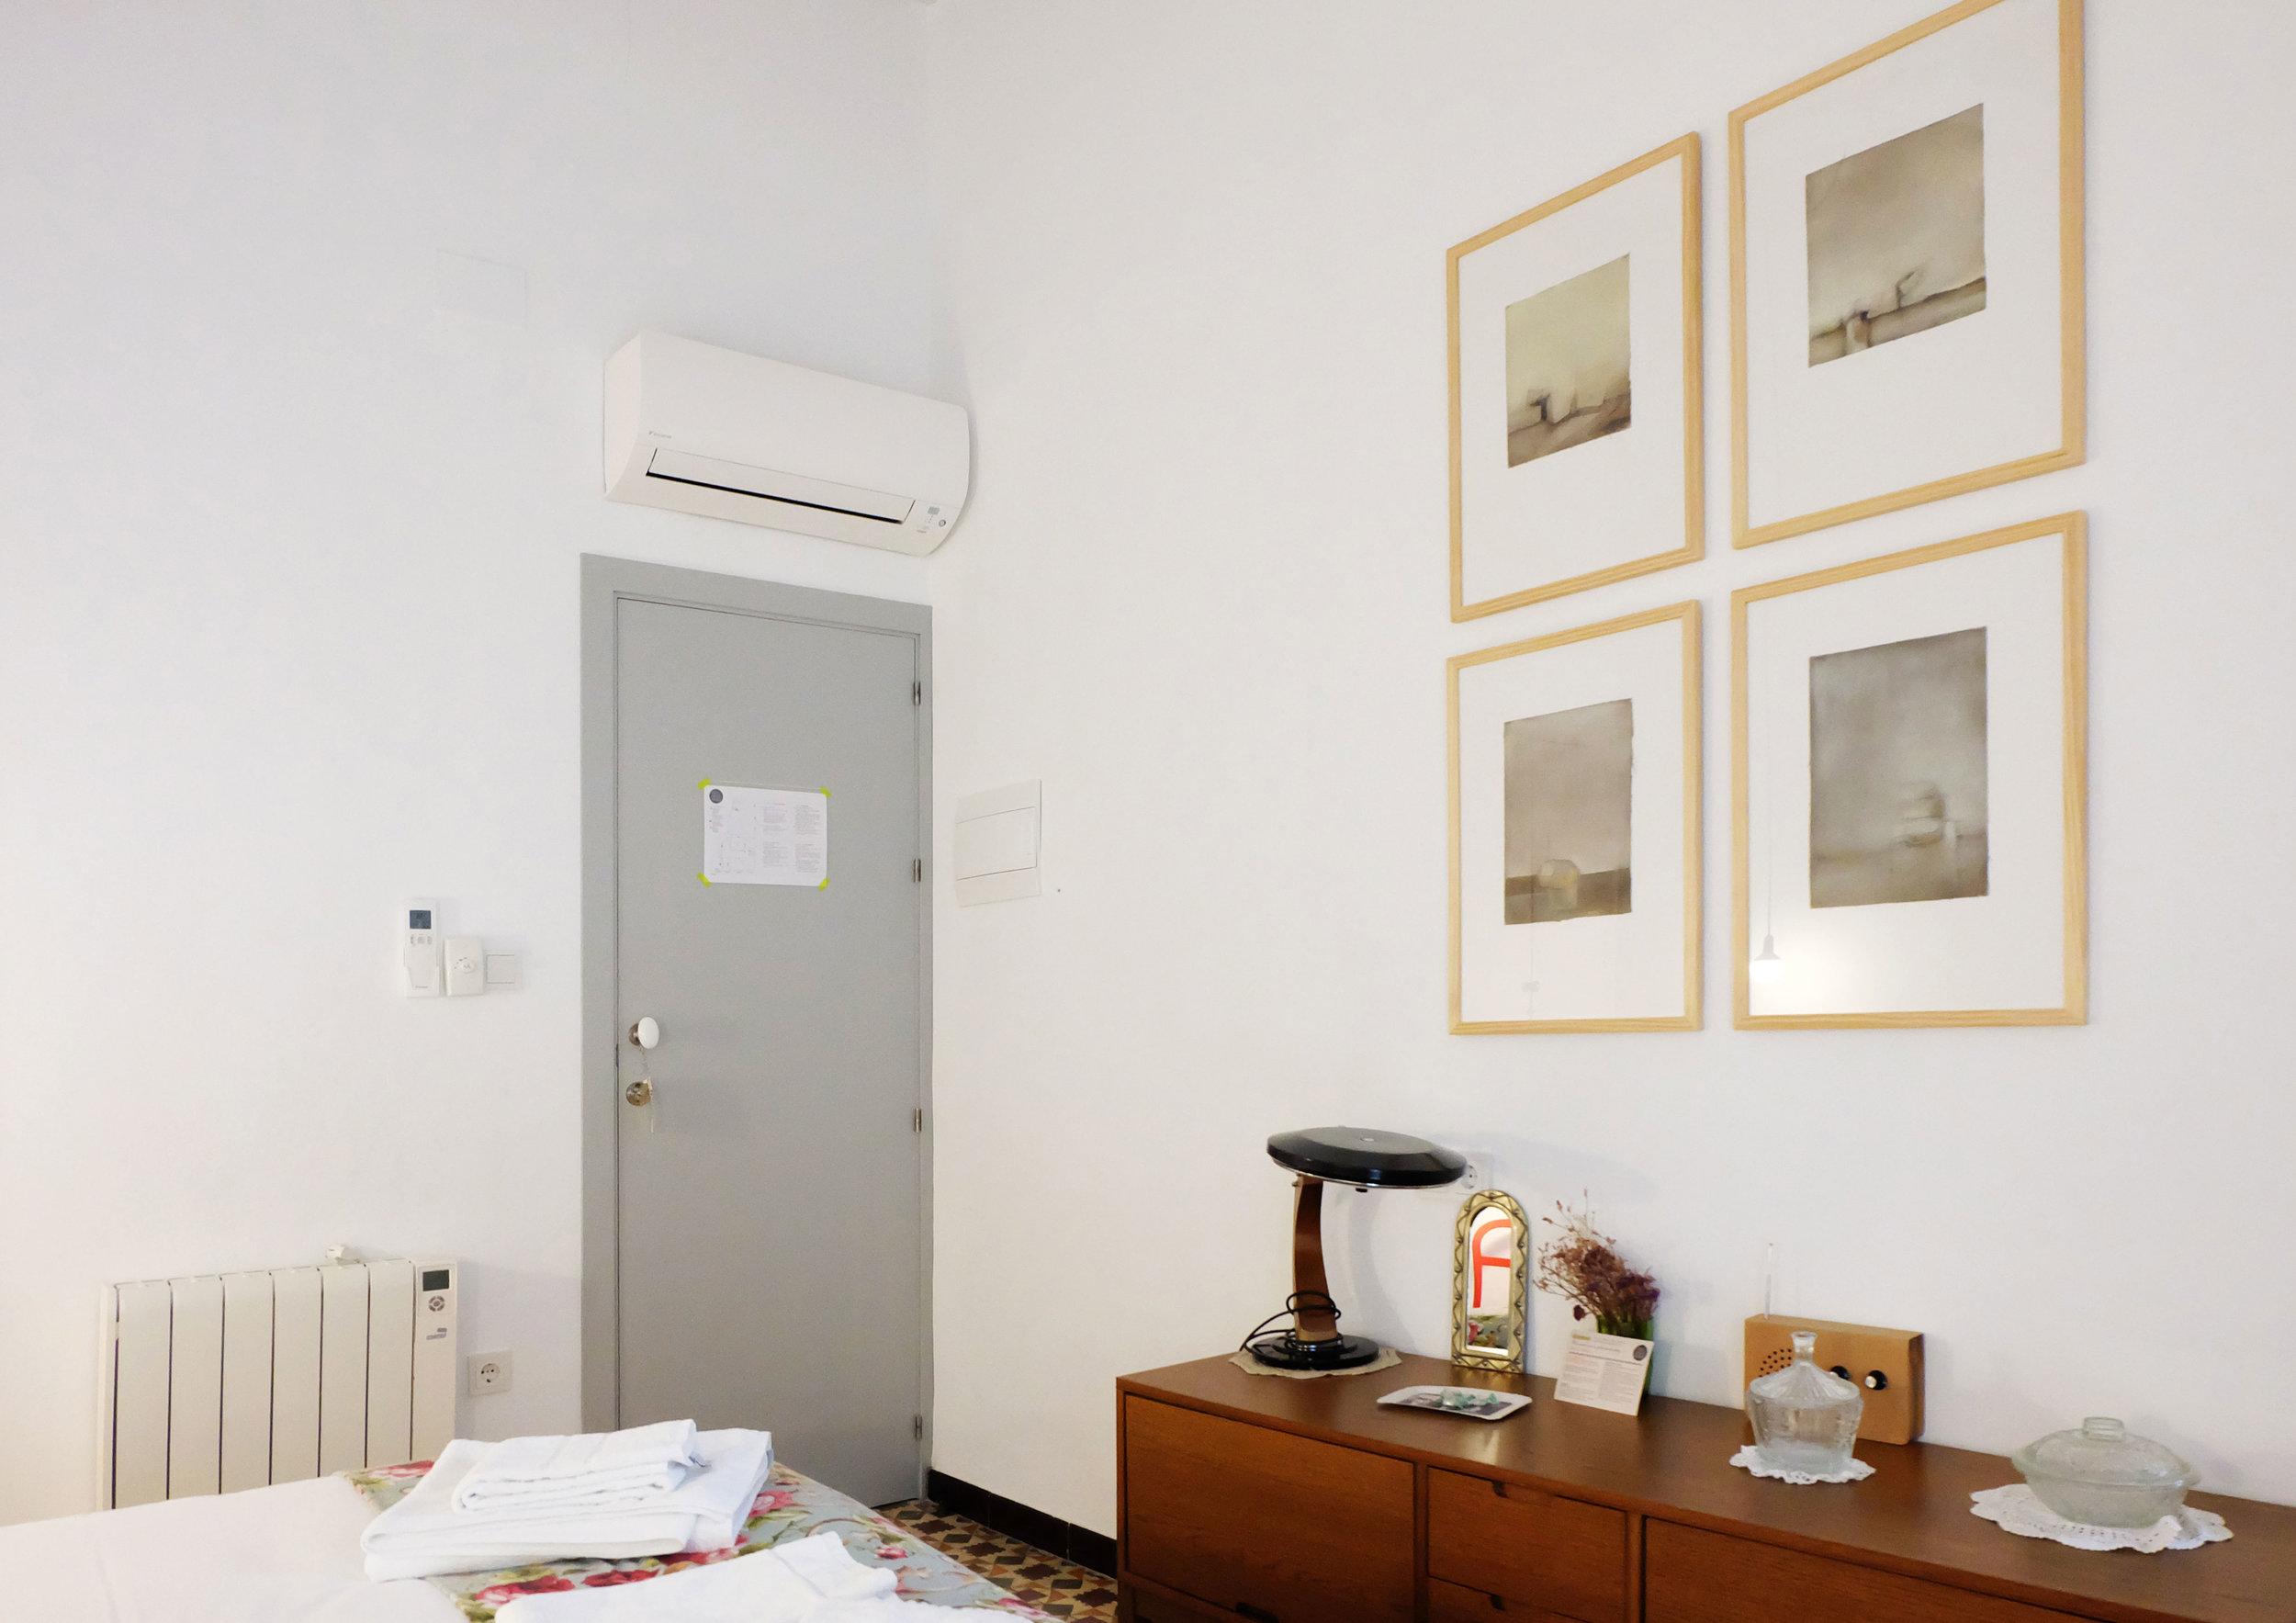 Hotel-Casa-de-huespedes-santa-maria-Habitacion-7-18.jpg